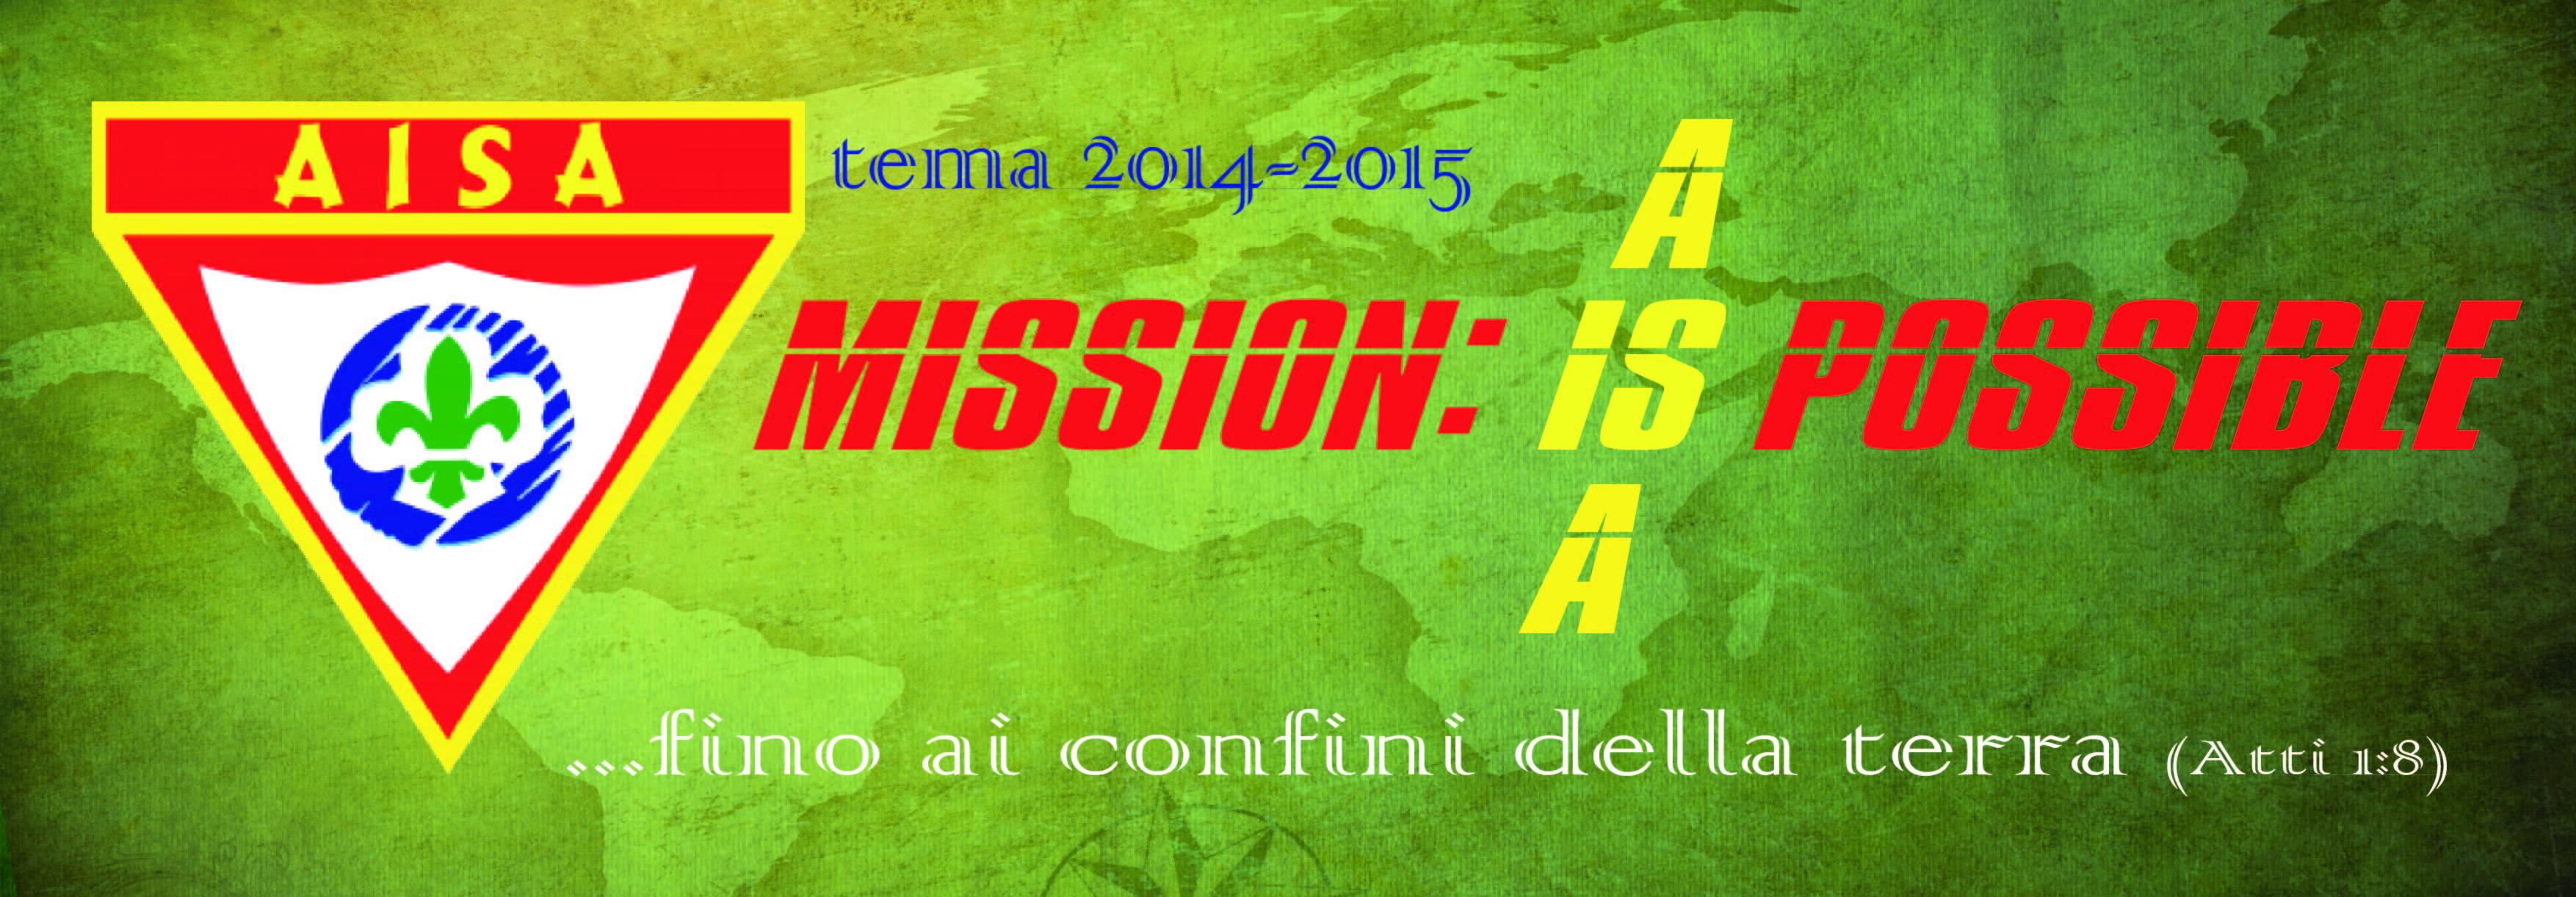 Tema AISA 2014-2015